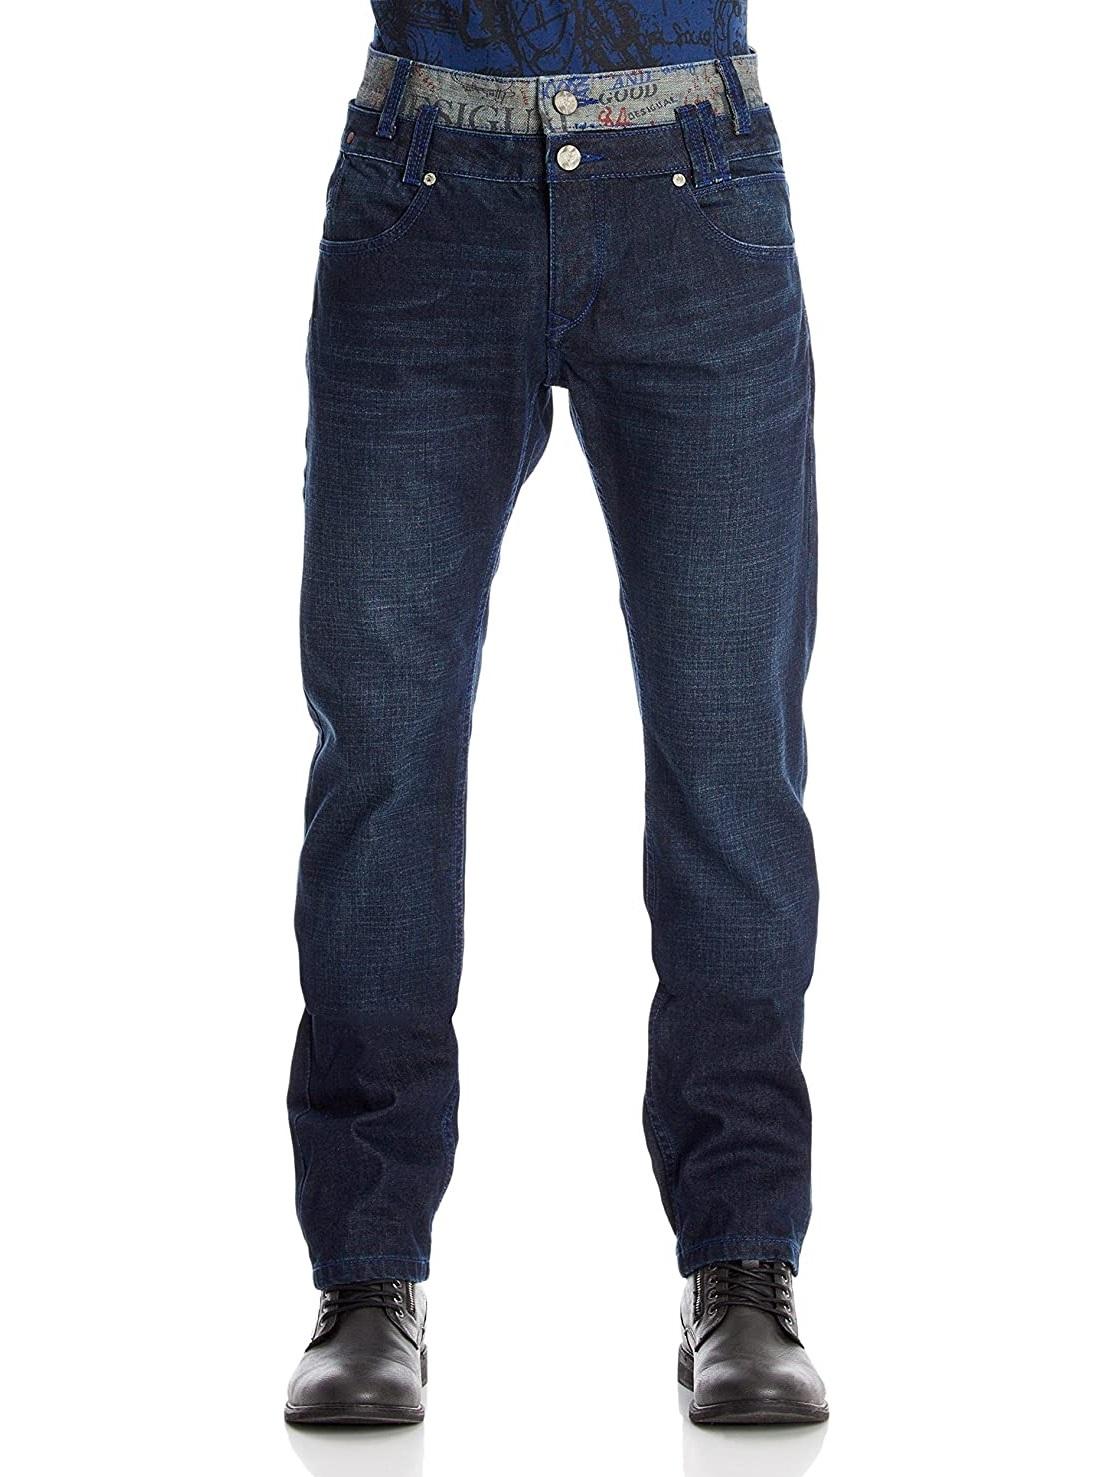 Джинсы Desigual 35d1803 Синий Free Style